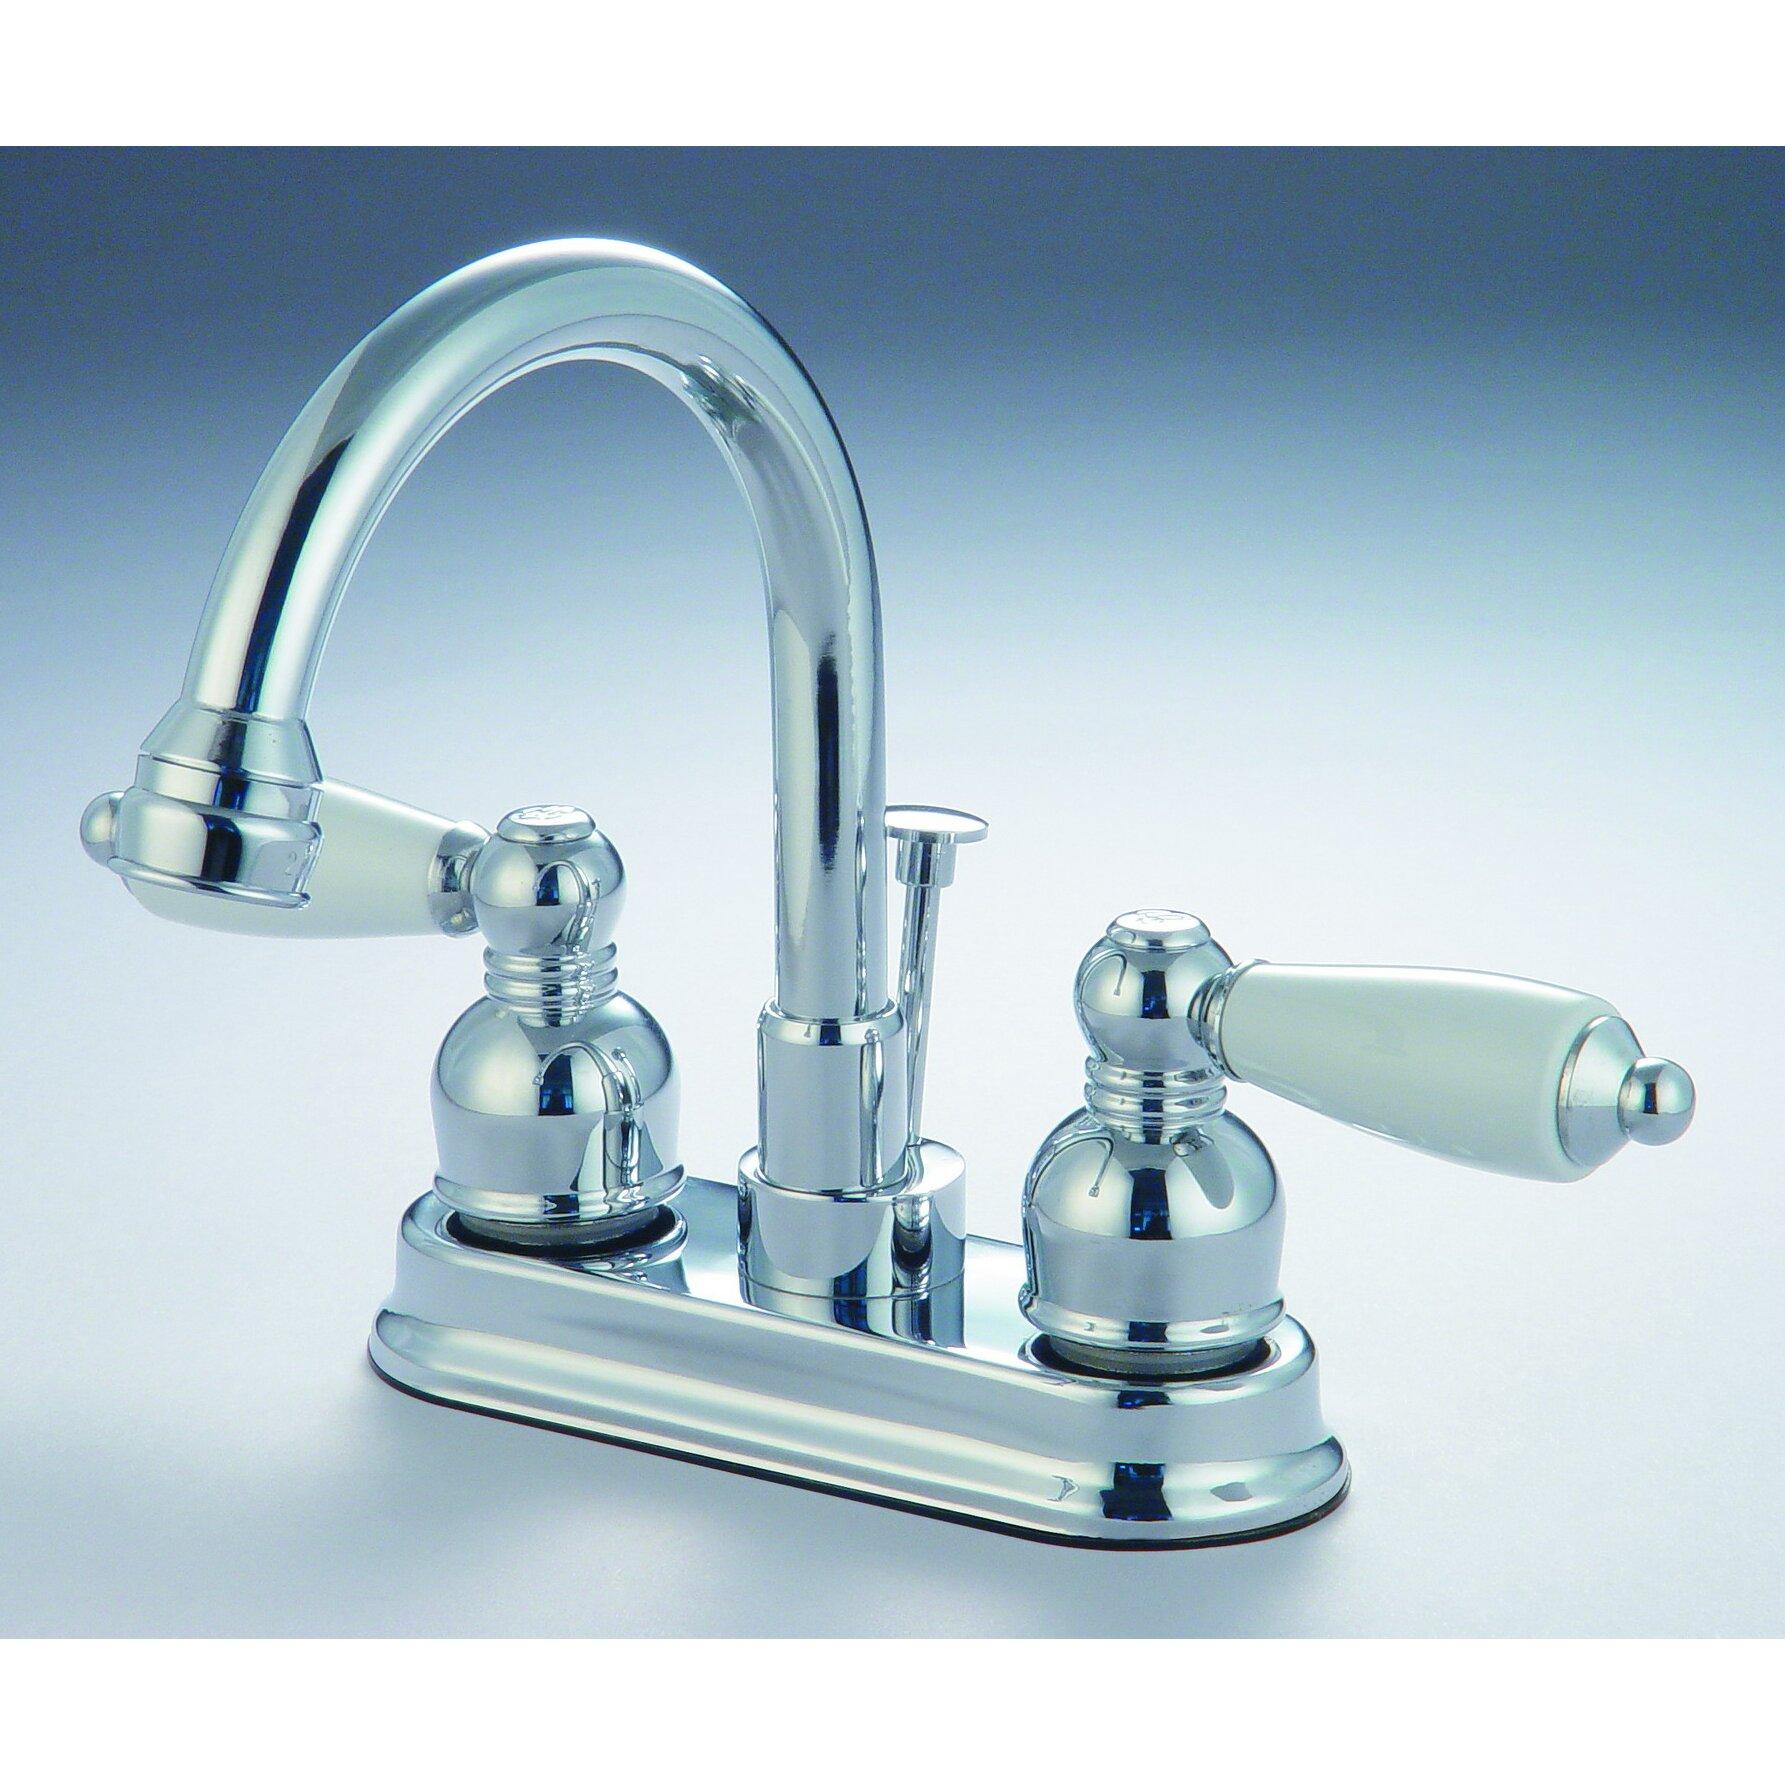 Funky American Standard Lav Faucets Gallery - Bathtub Ideas - dilata ...